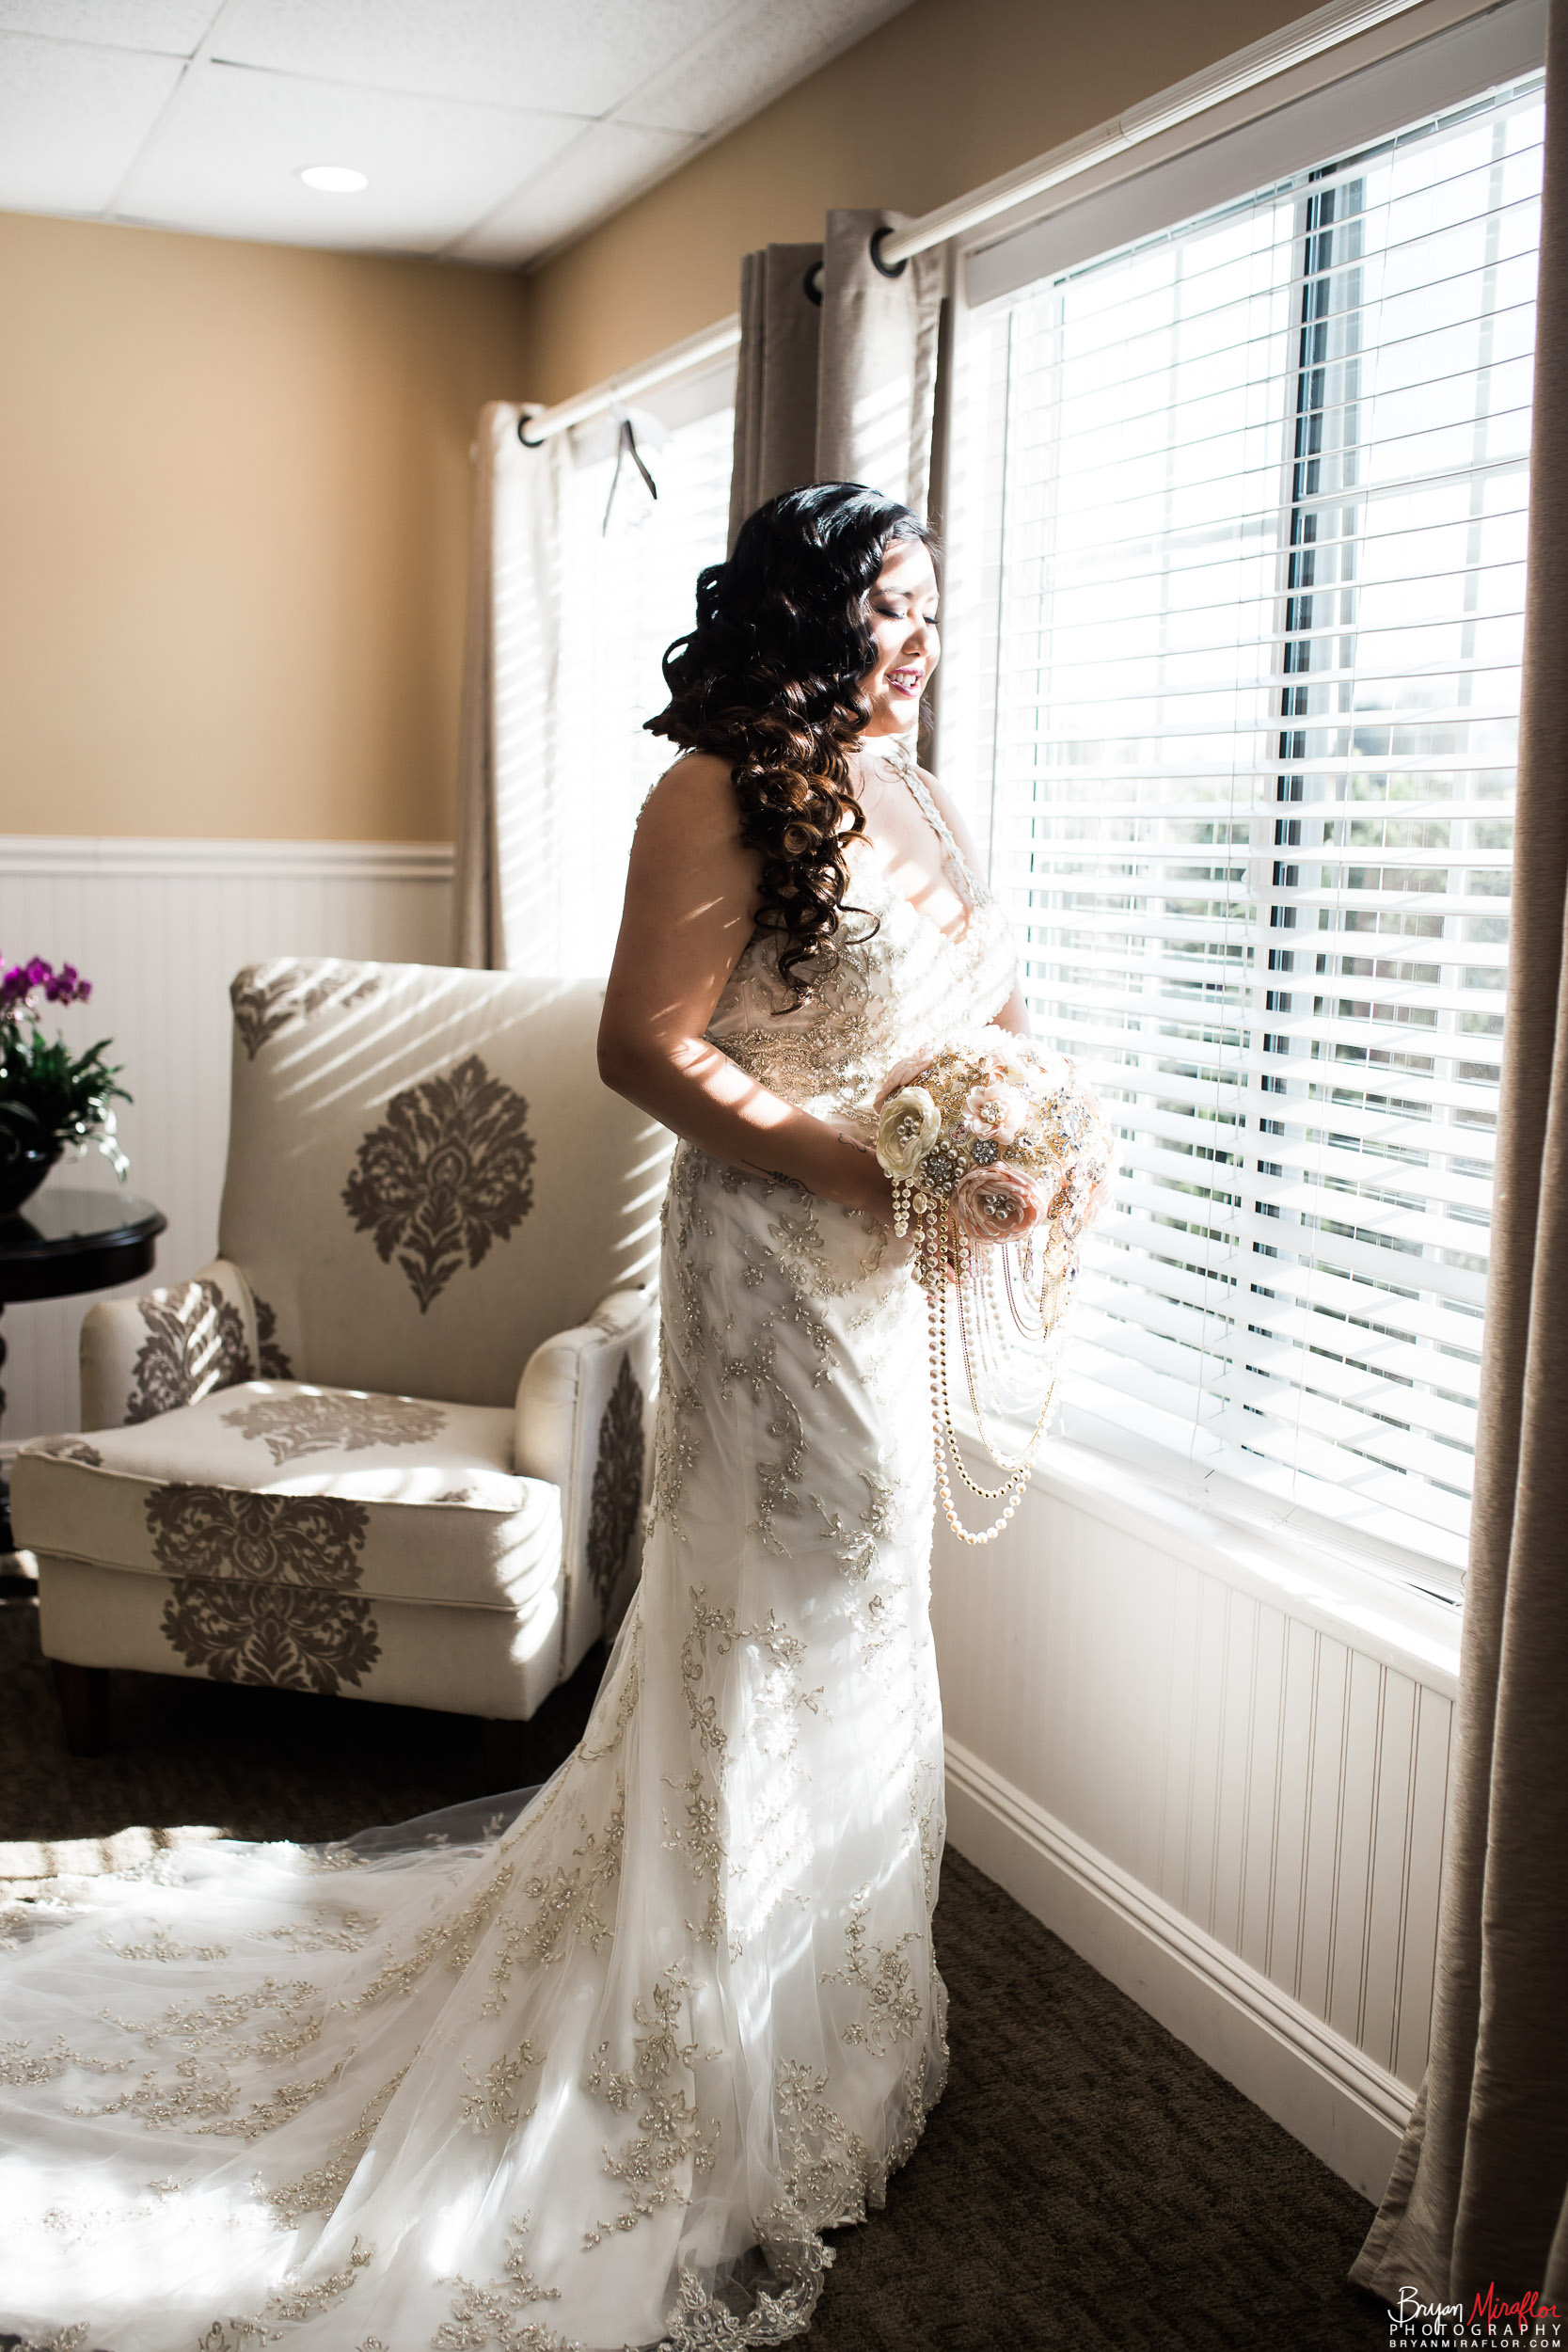 Bryan-Miraflor-Photography-Hannah-Jonathan-Married-Grand-Traditions-Estate-Gardens-Fallbrook-20171222-038.jpg